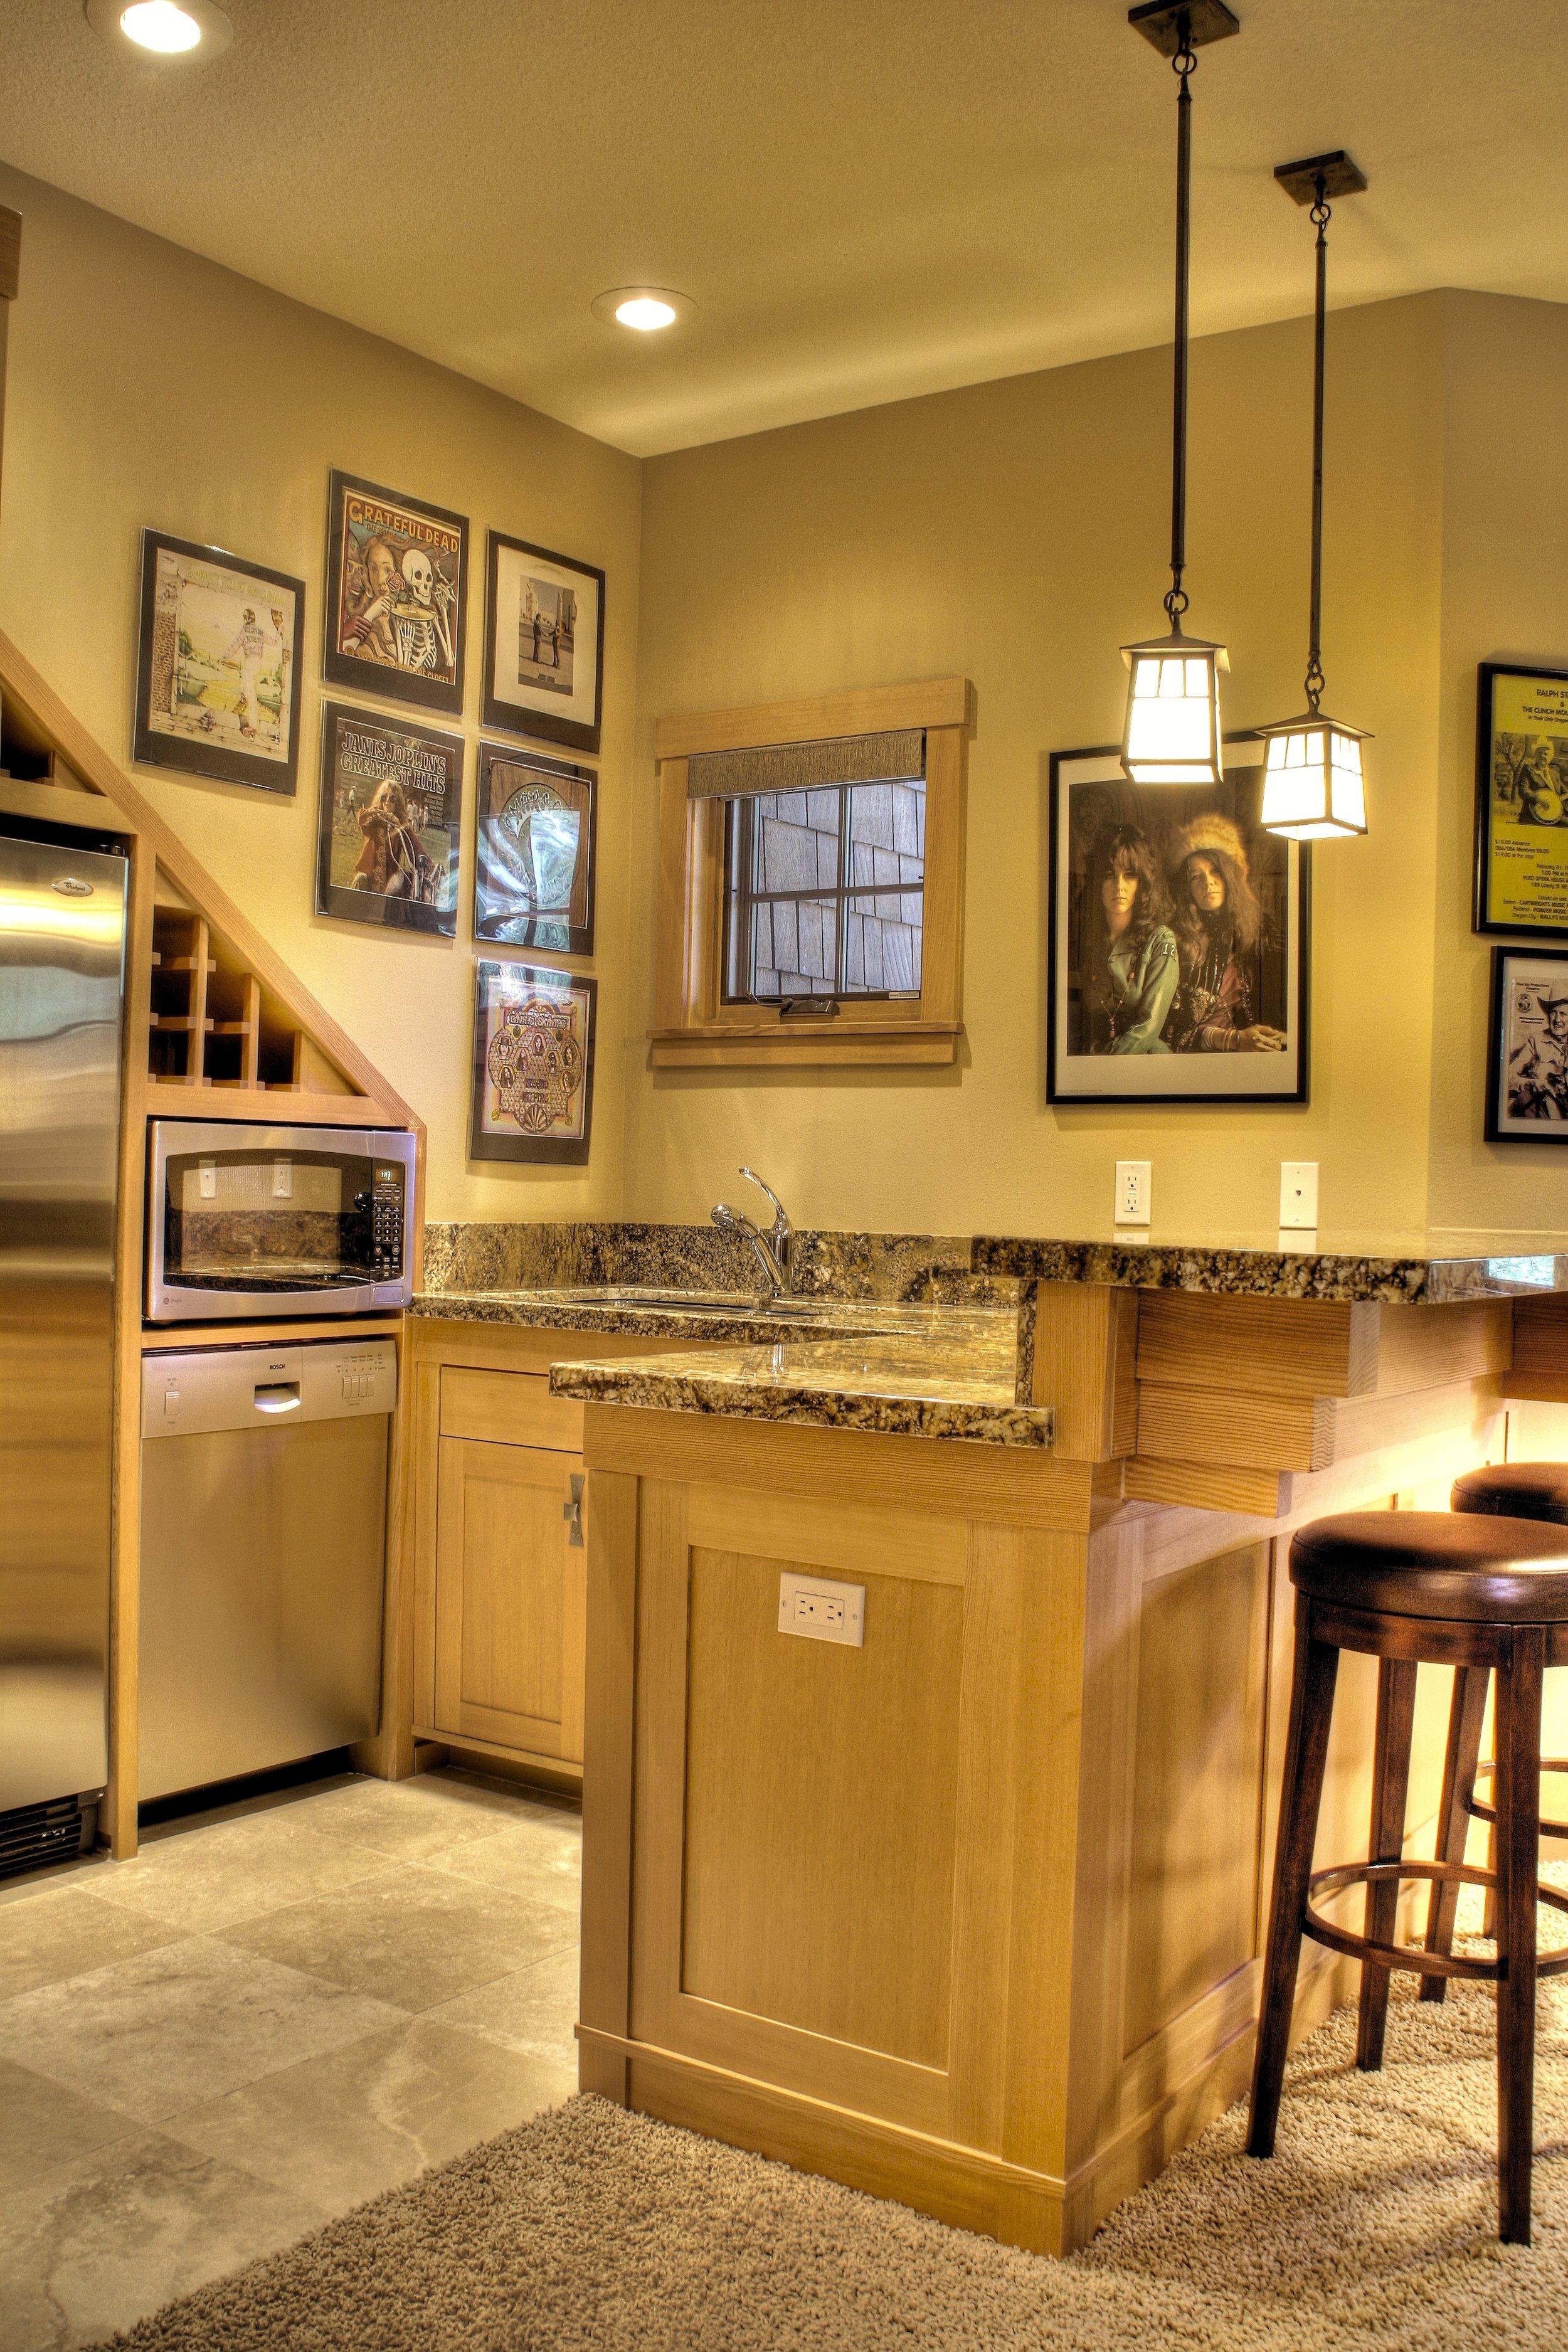 12 Media Room Kitchen - Copy.jpg